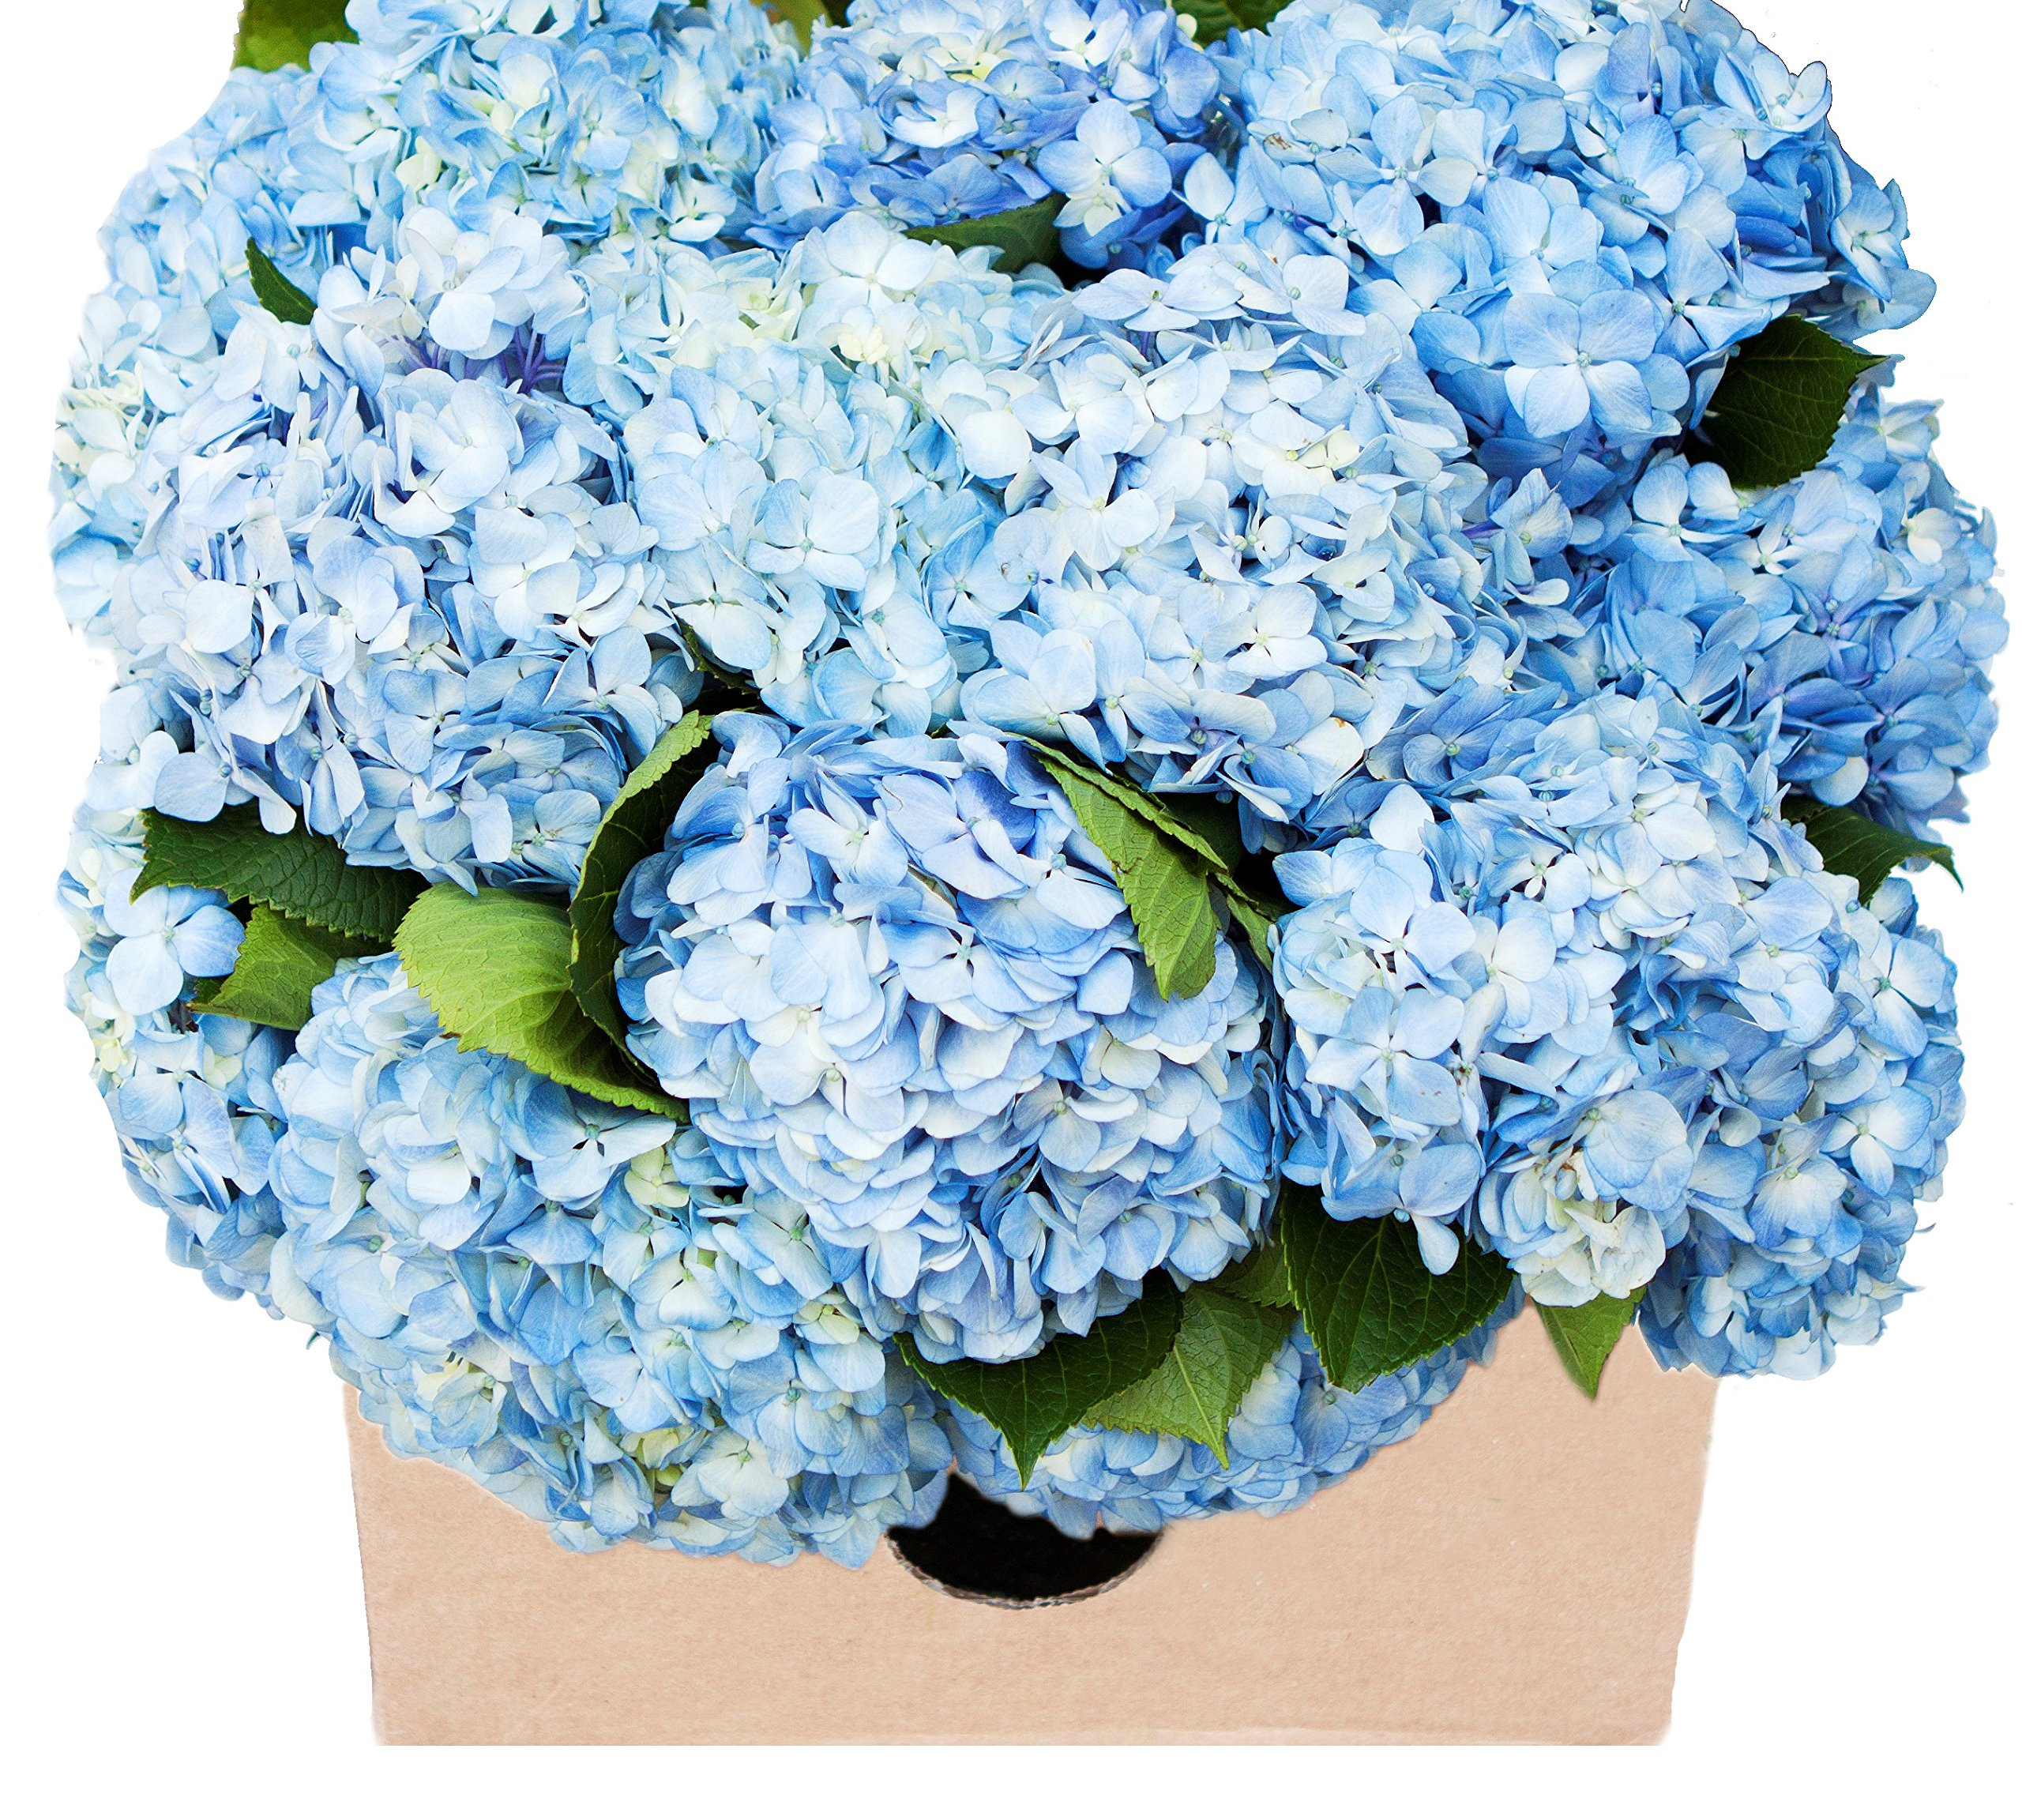 Blooms2Door 15 Blue Hydrangeas (Farm-Fresh, Naturally Colored, Premium Quality) by Blooms2Door (Image #1)